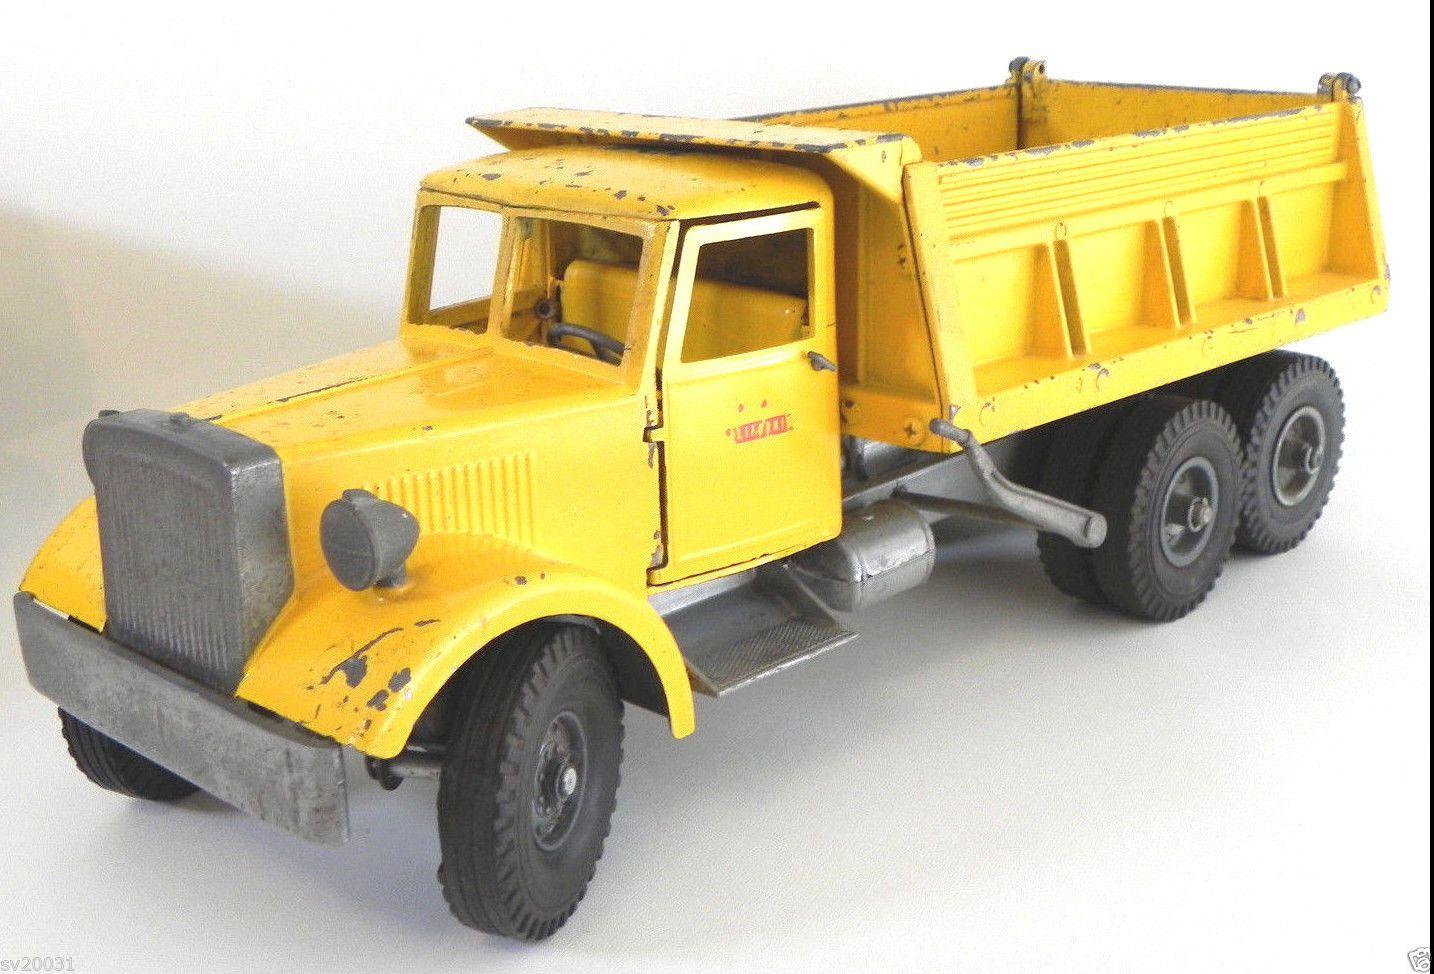 Vintage Toy Trucks Part - 44: Vintage 1950u0027s Mic Smith Miller Pressed Steel Yellow Hydraulic Dump Truck |  EBay